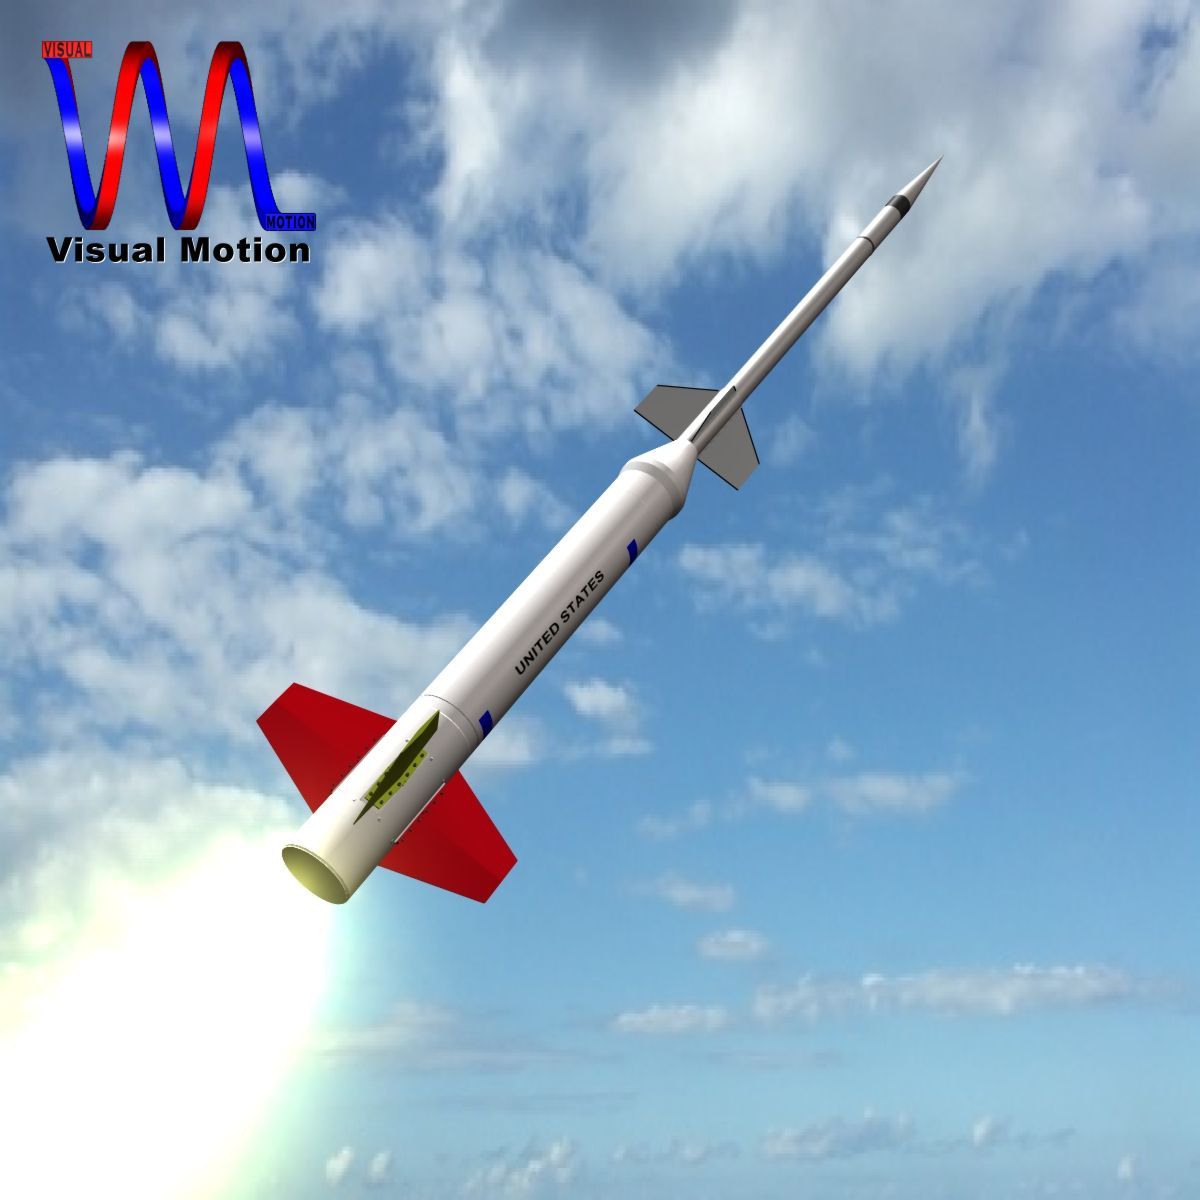 us nike cajun rocket 3d model 3ds dxf x cod scn obj 149286